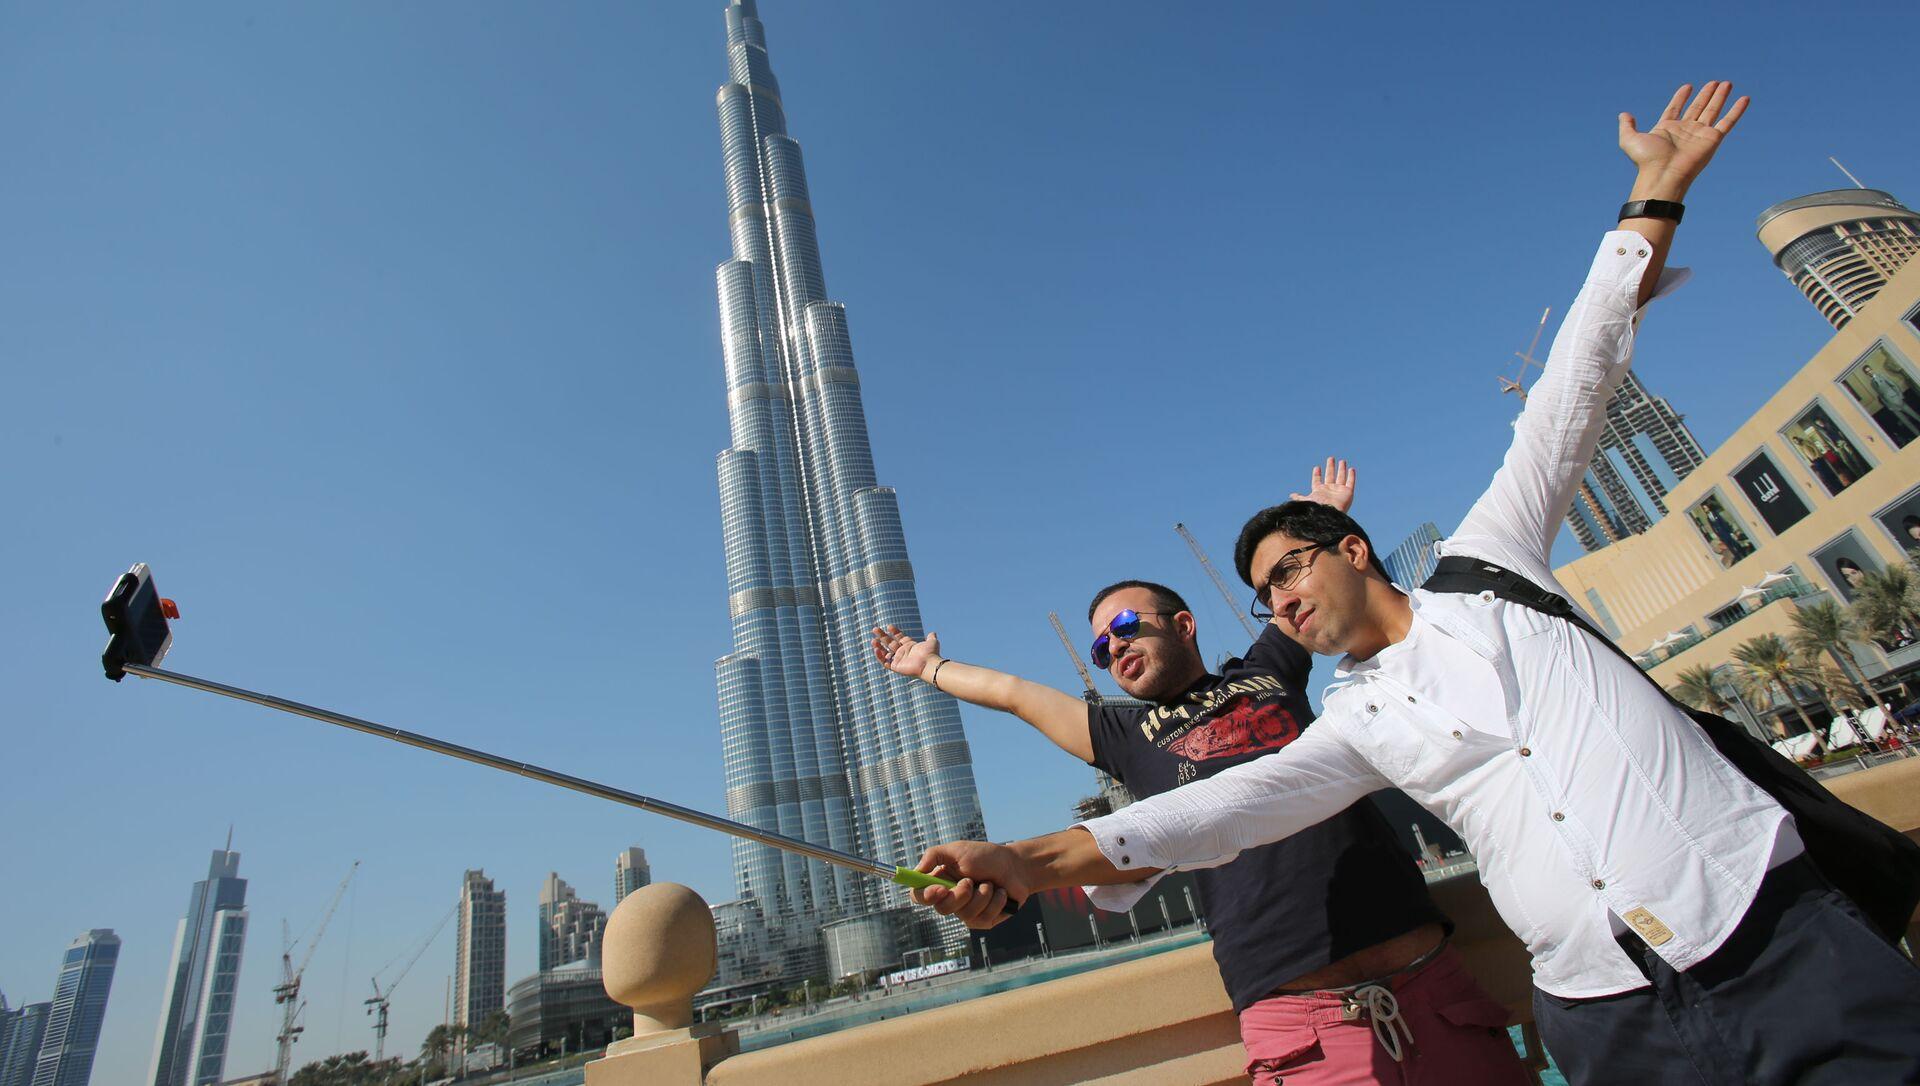 Туристы у небоскреба Бурдж-Халифа в Дубае - Sputnik Italia, 1920, 22.04.2021